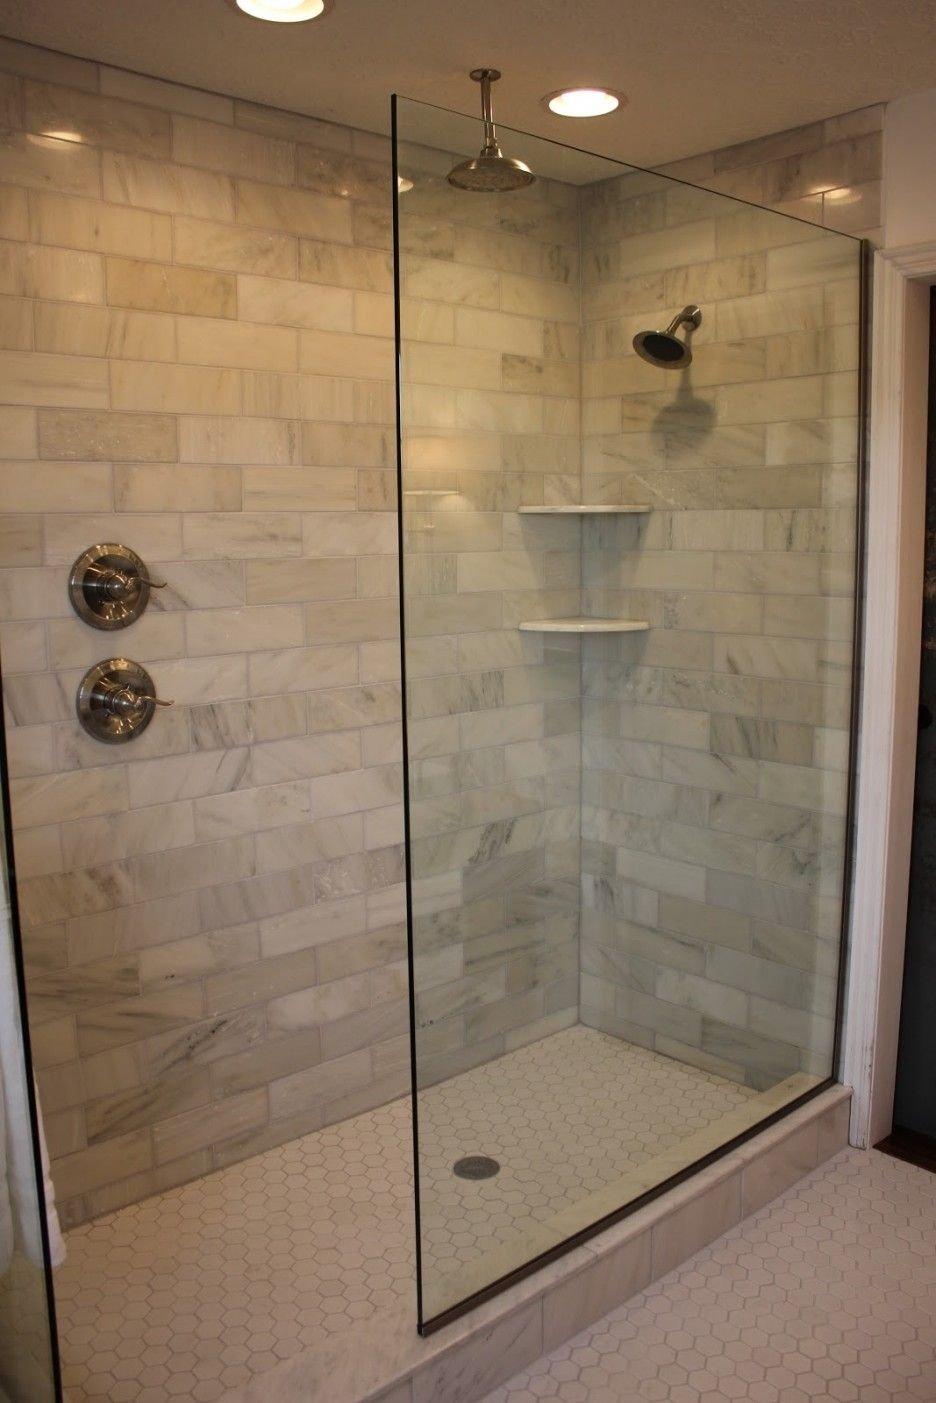 10 Spectacular Doorless Walk In Shower Ideas doorless walk in shower designs shower handle on separate wall 1